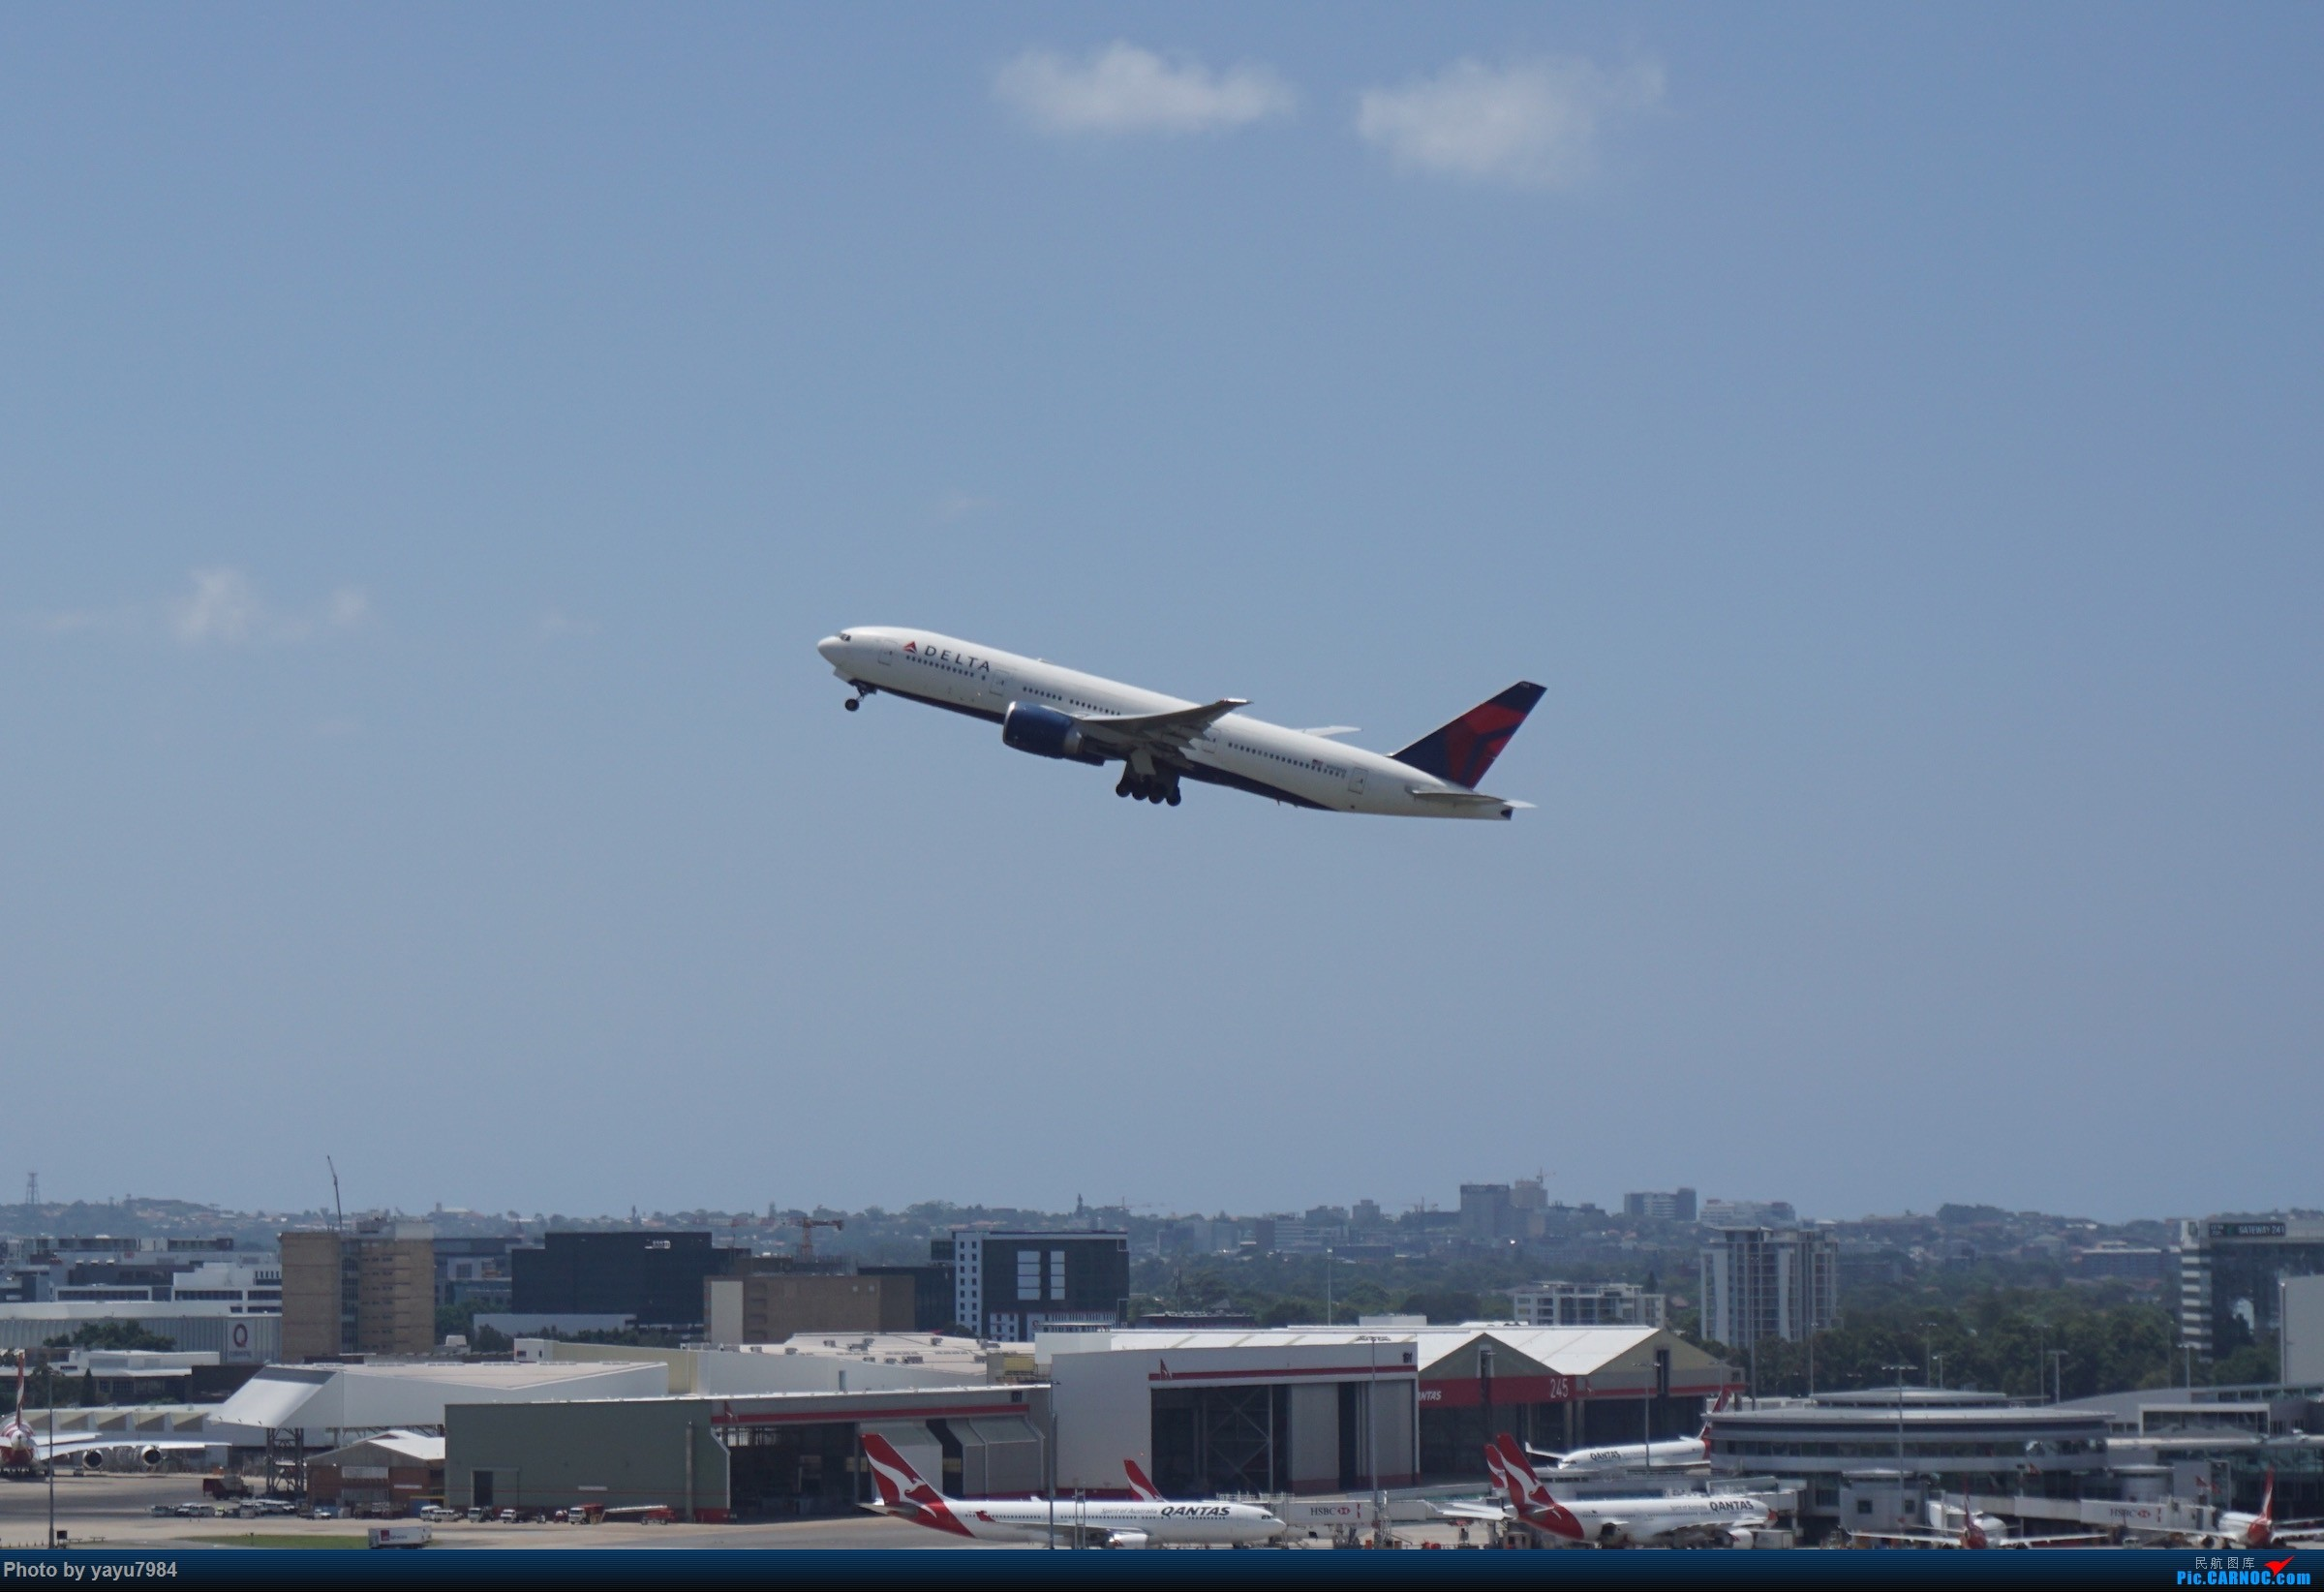 Re:[原创][SYD] 停车楼顶看宽体 BOEING 777-200LR N705DN 澳大利亚悉尼金斯福德·史密斯机场